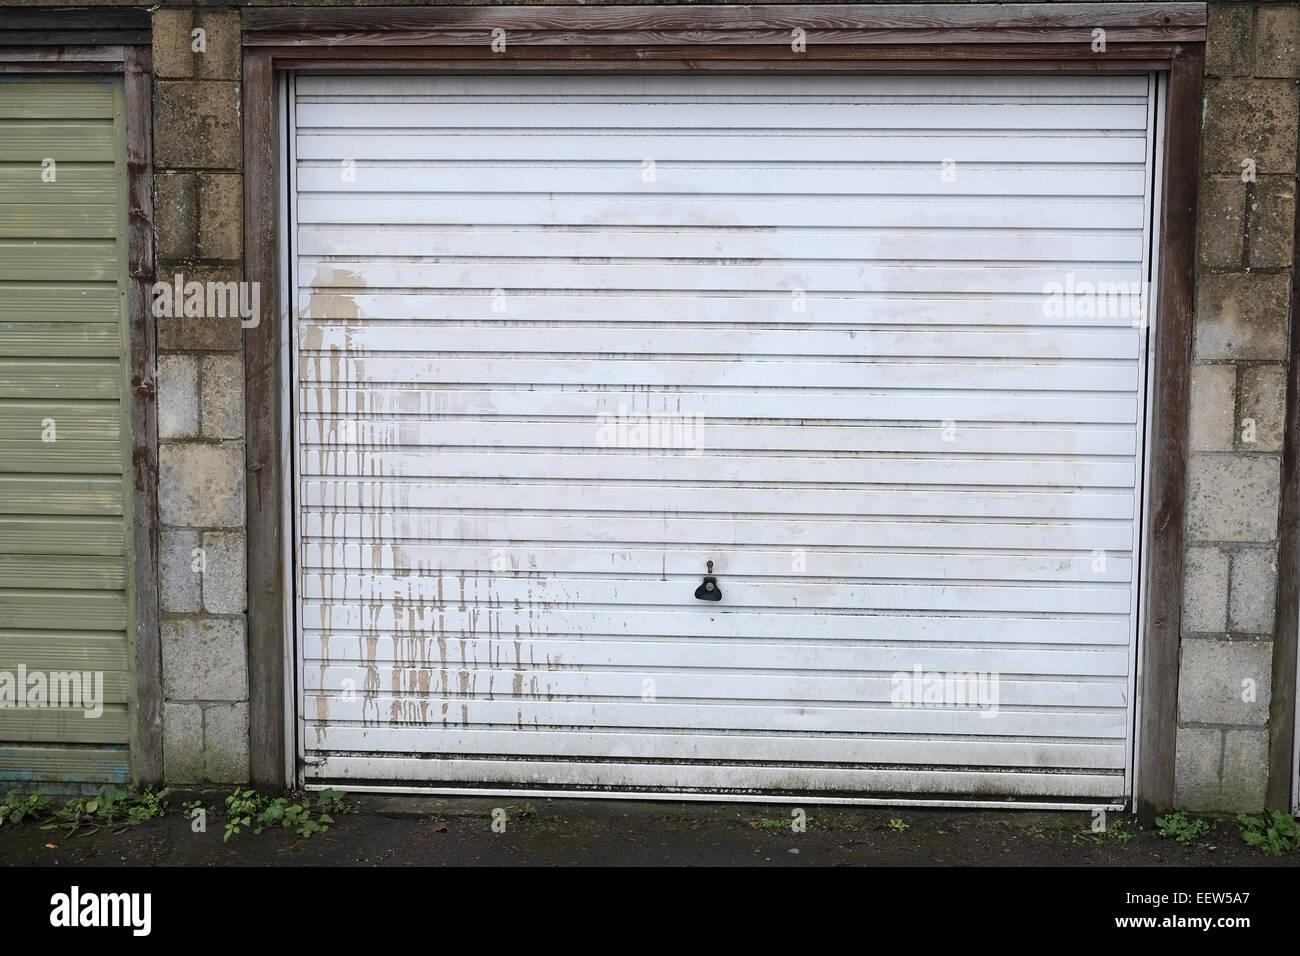 Old worn garage door suitable for a background or texture